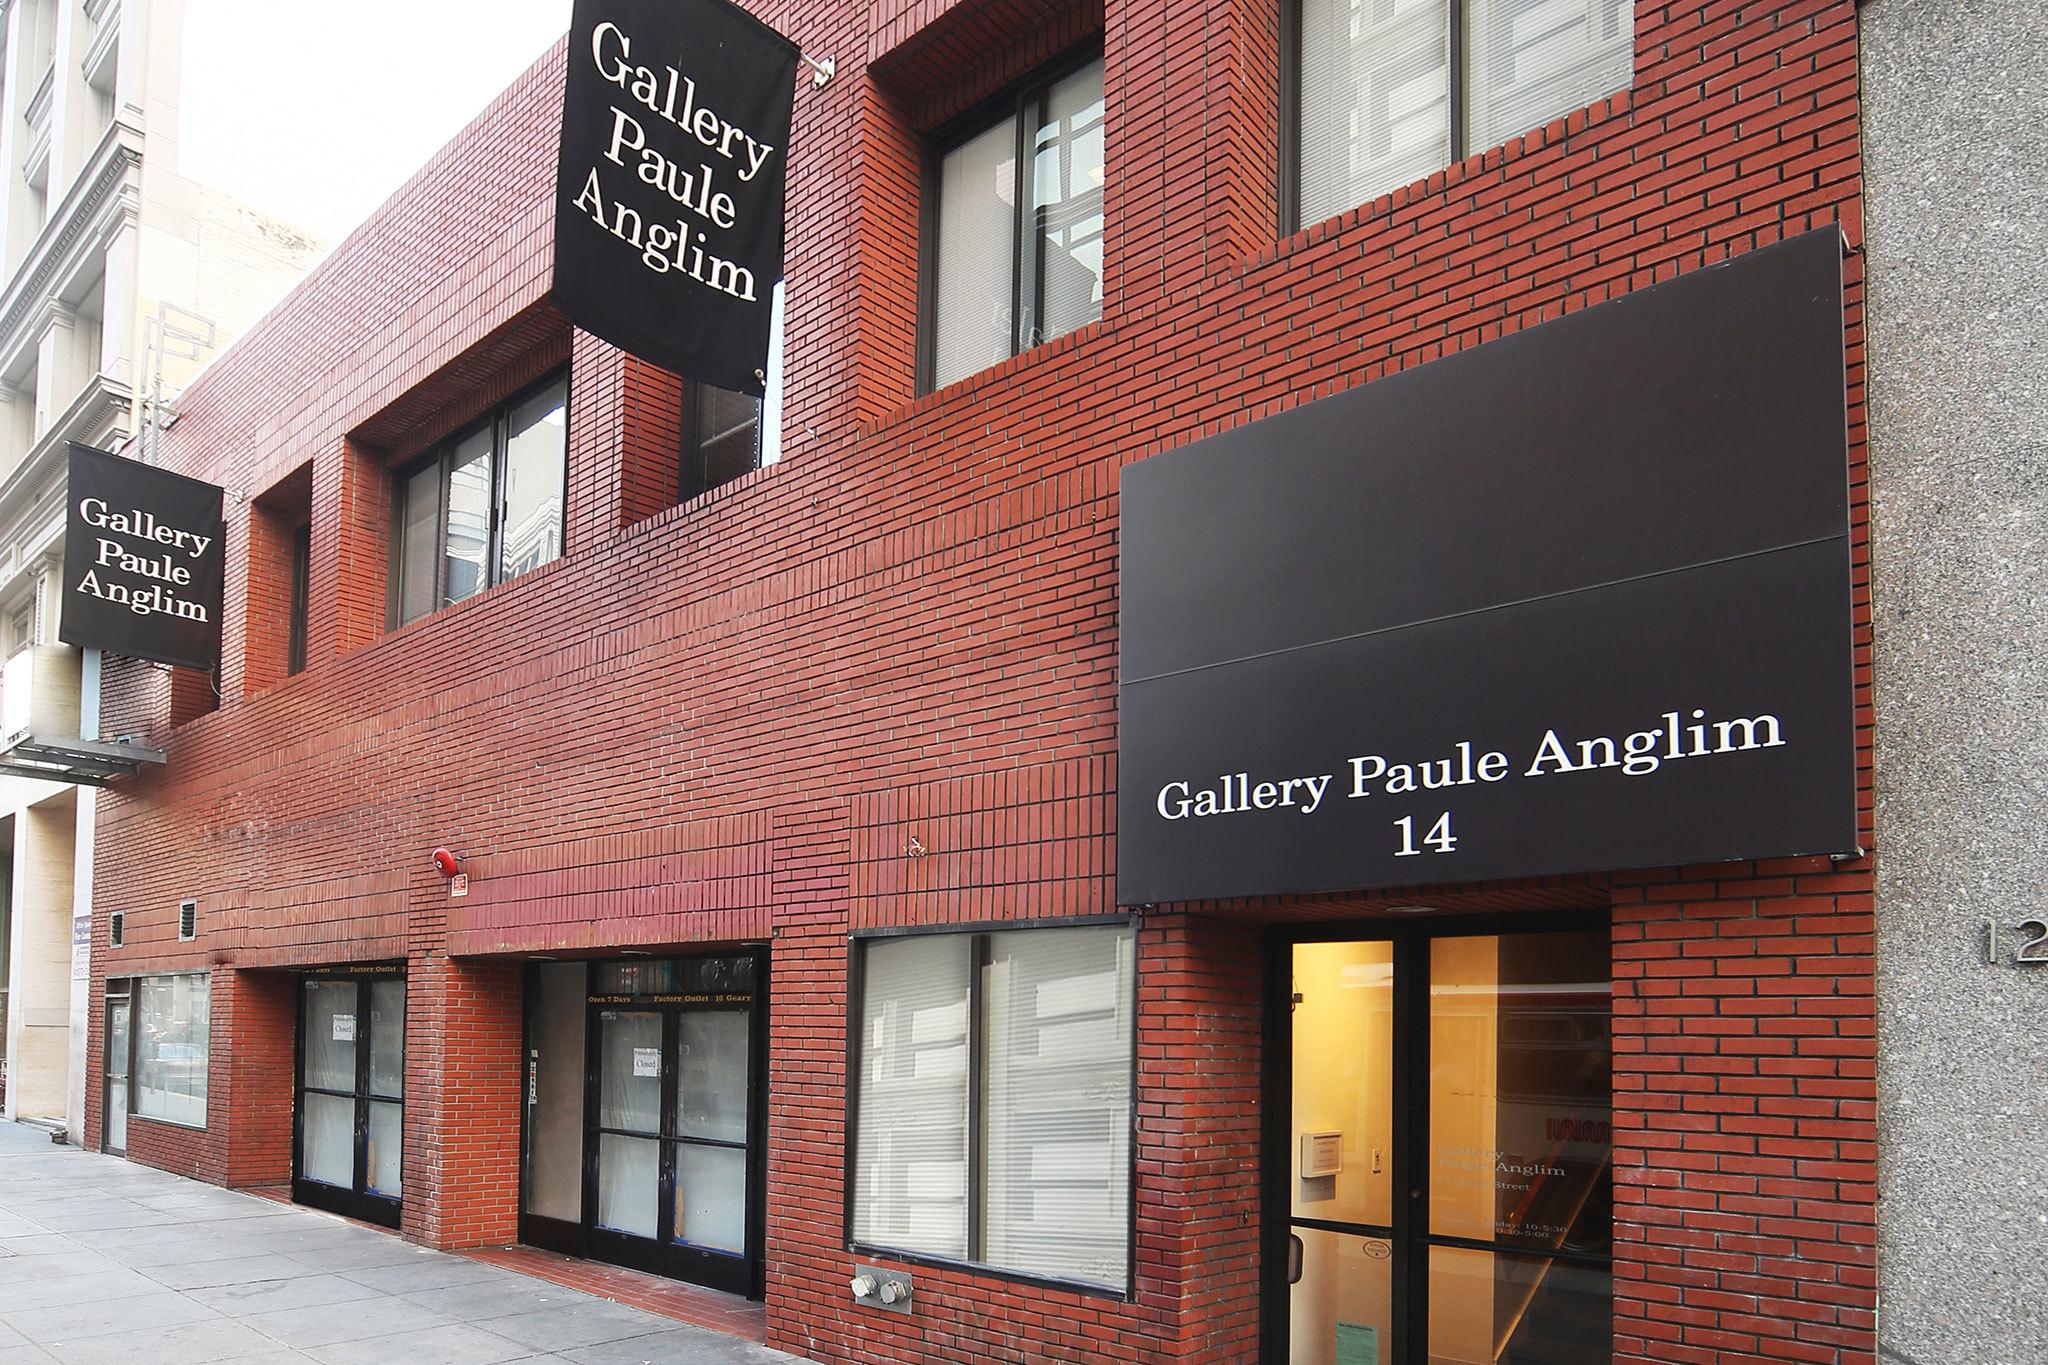 Gallery Paule Anglim